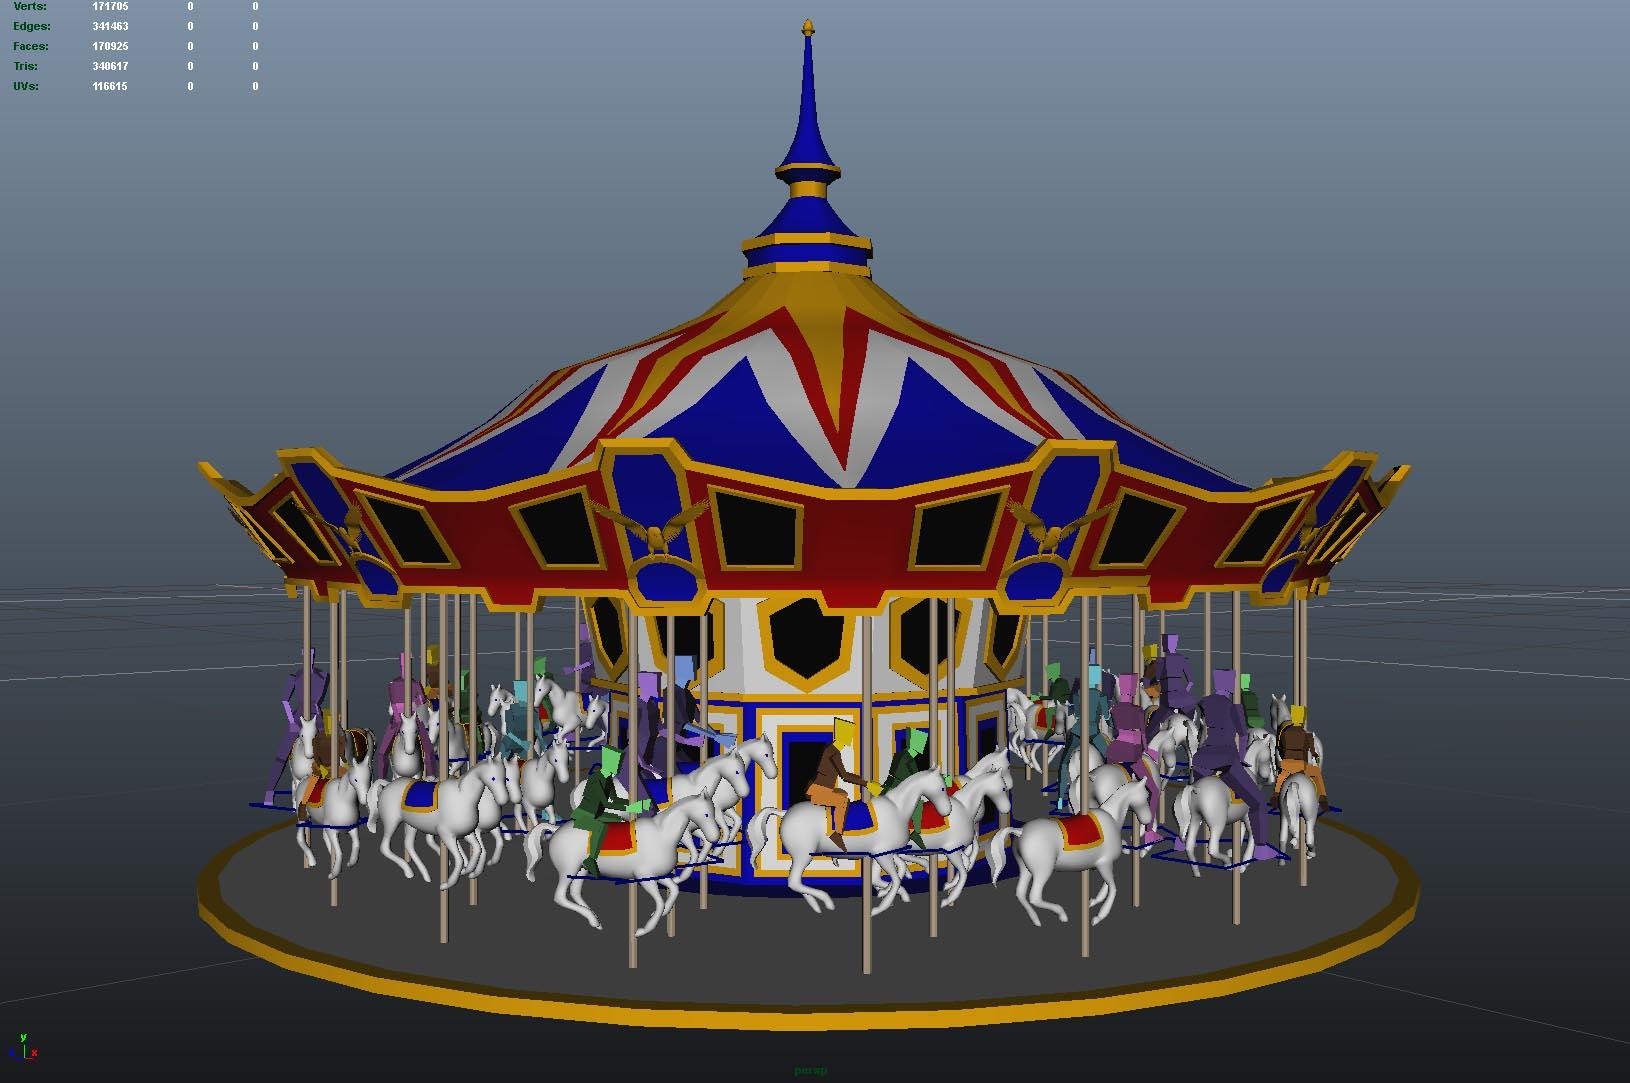 Carousel_Shaded.jpg